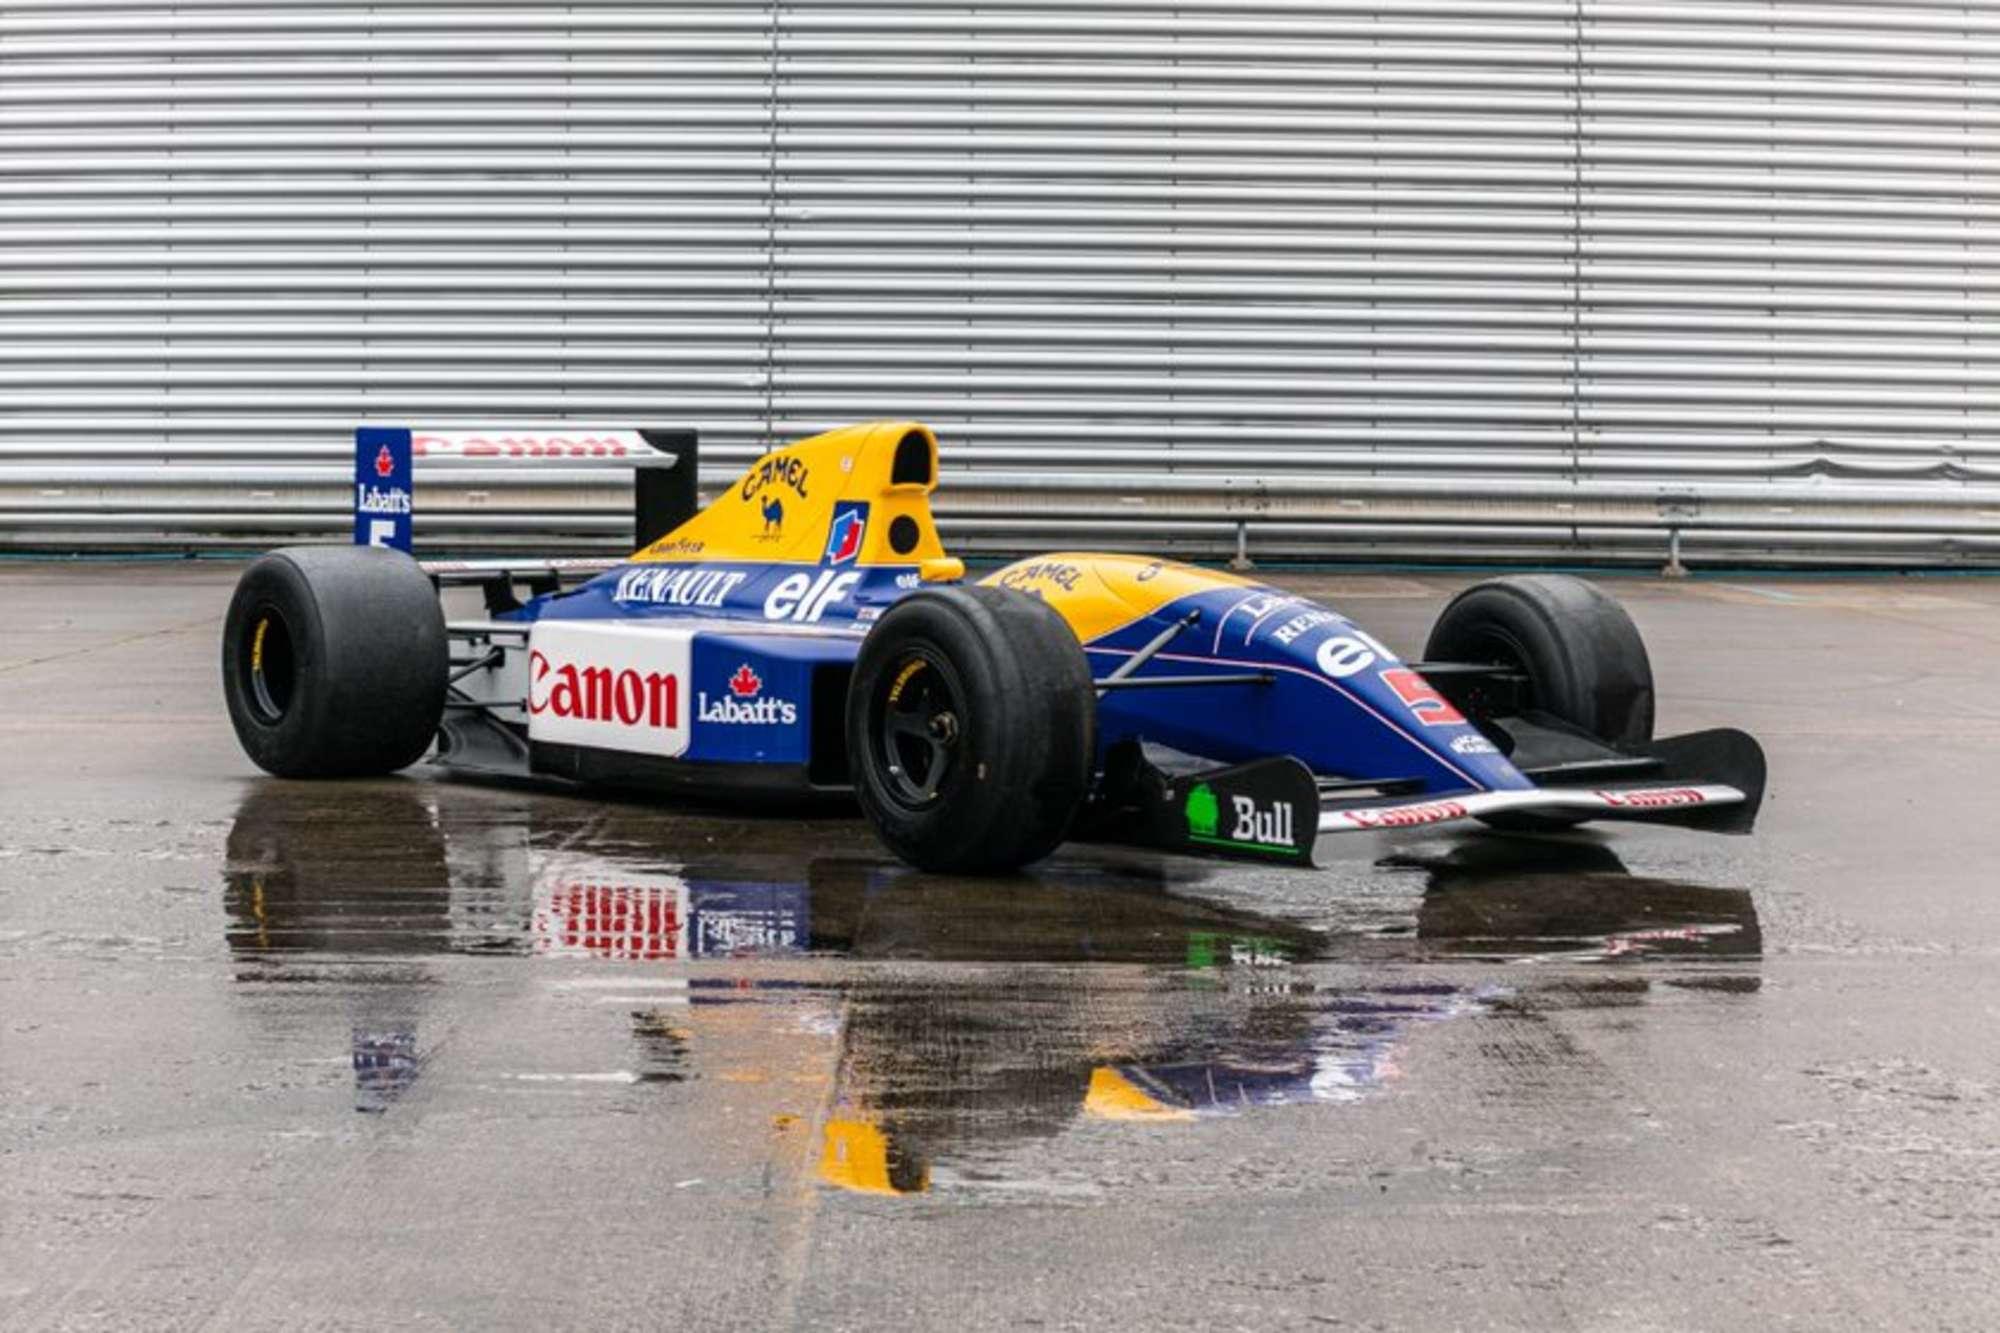 Williams FW14 show car 10